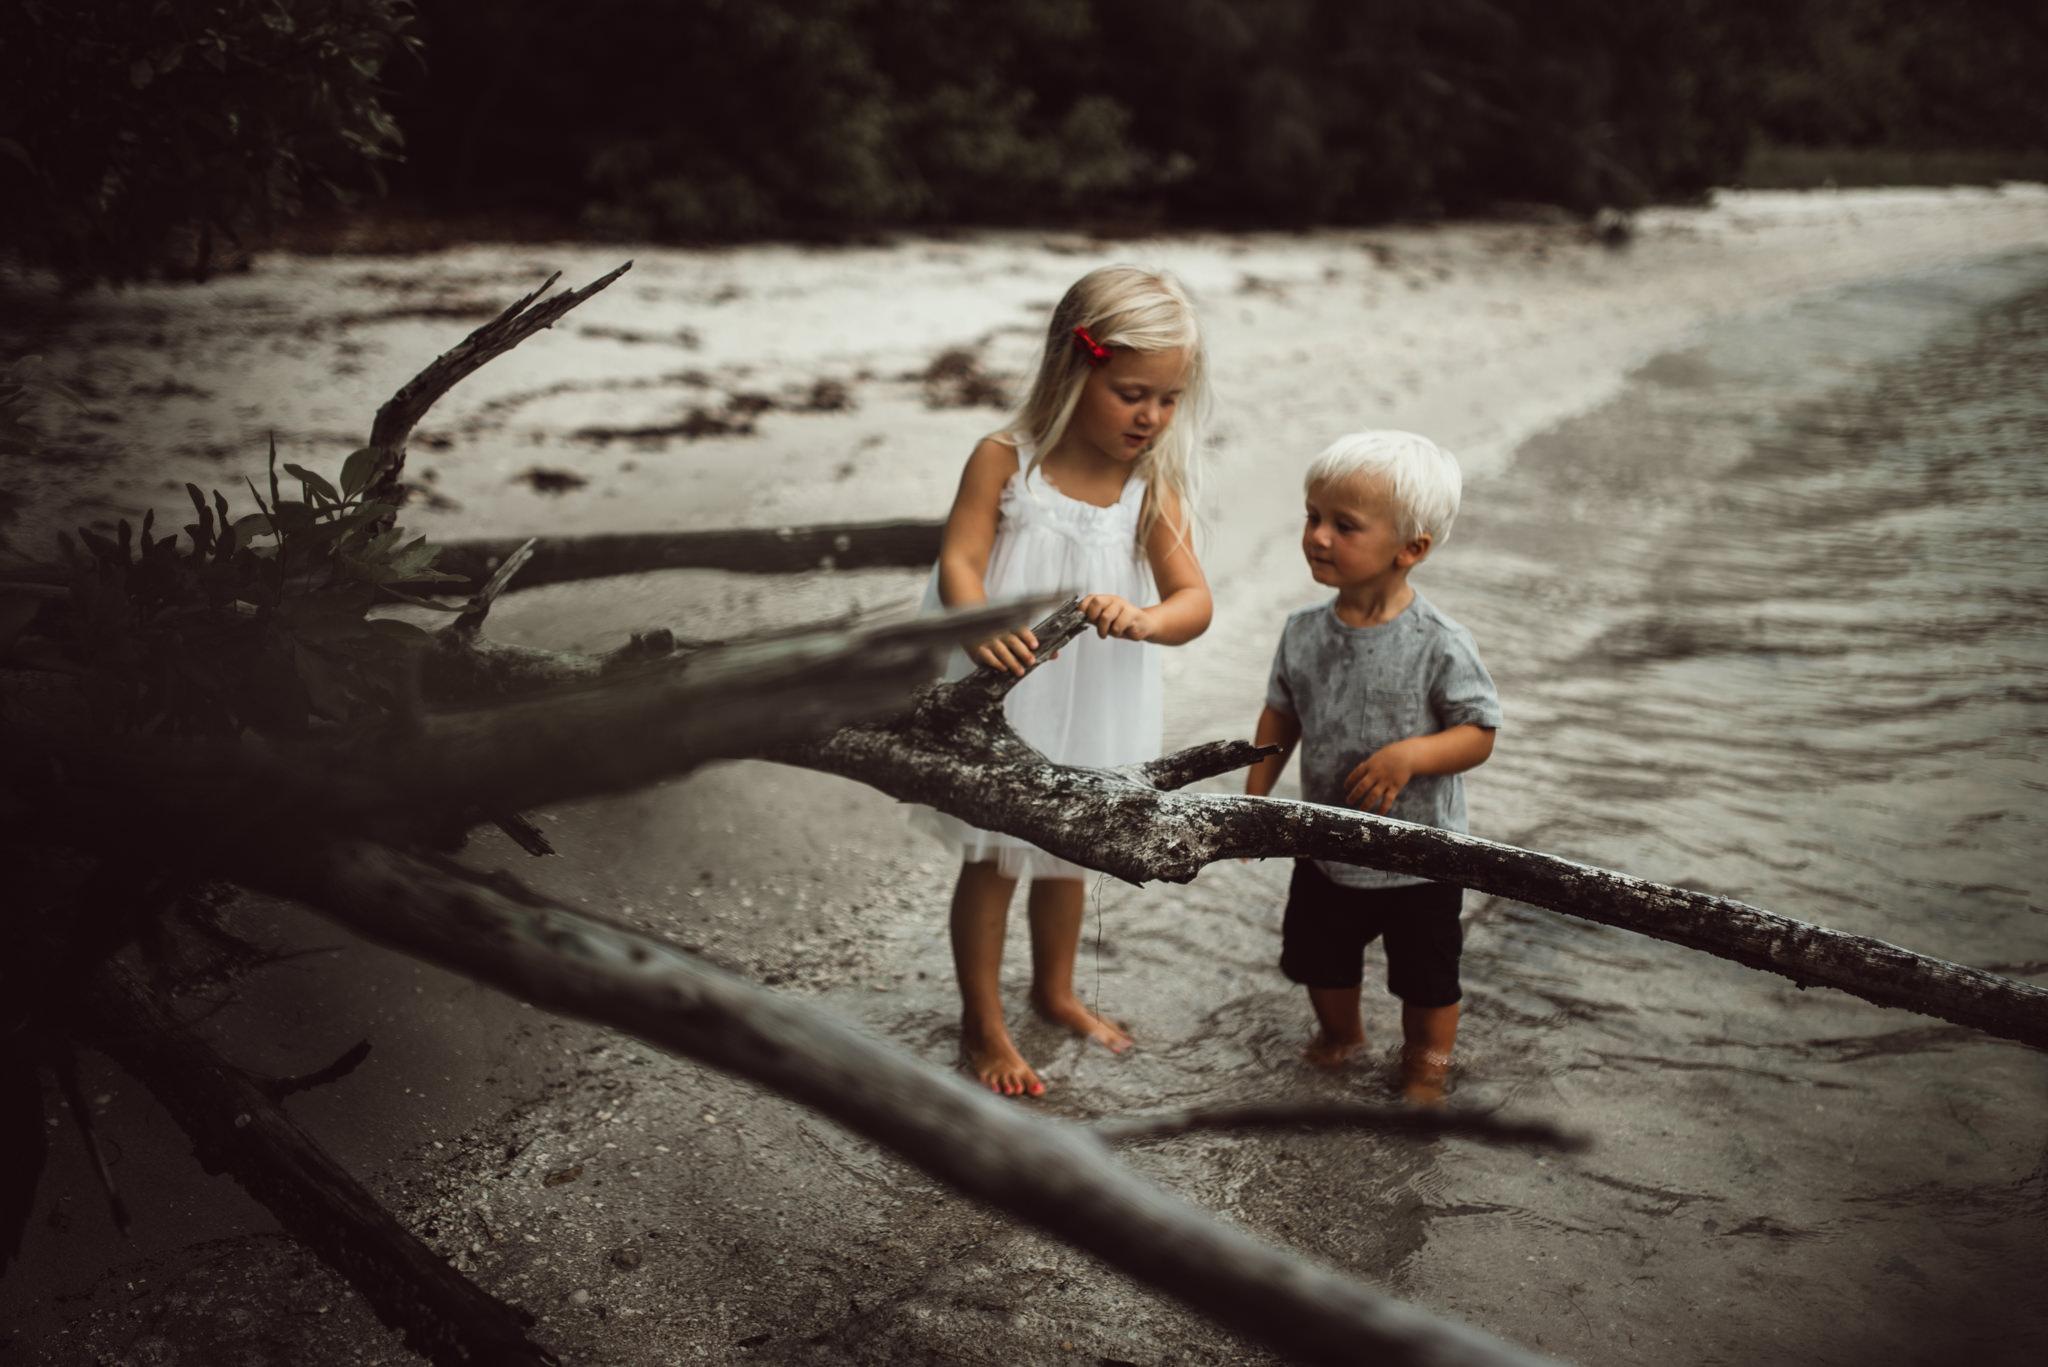 twyla jones photography - treasure coast florida - island family session-5262.jpg